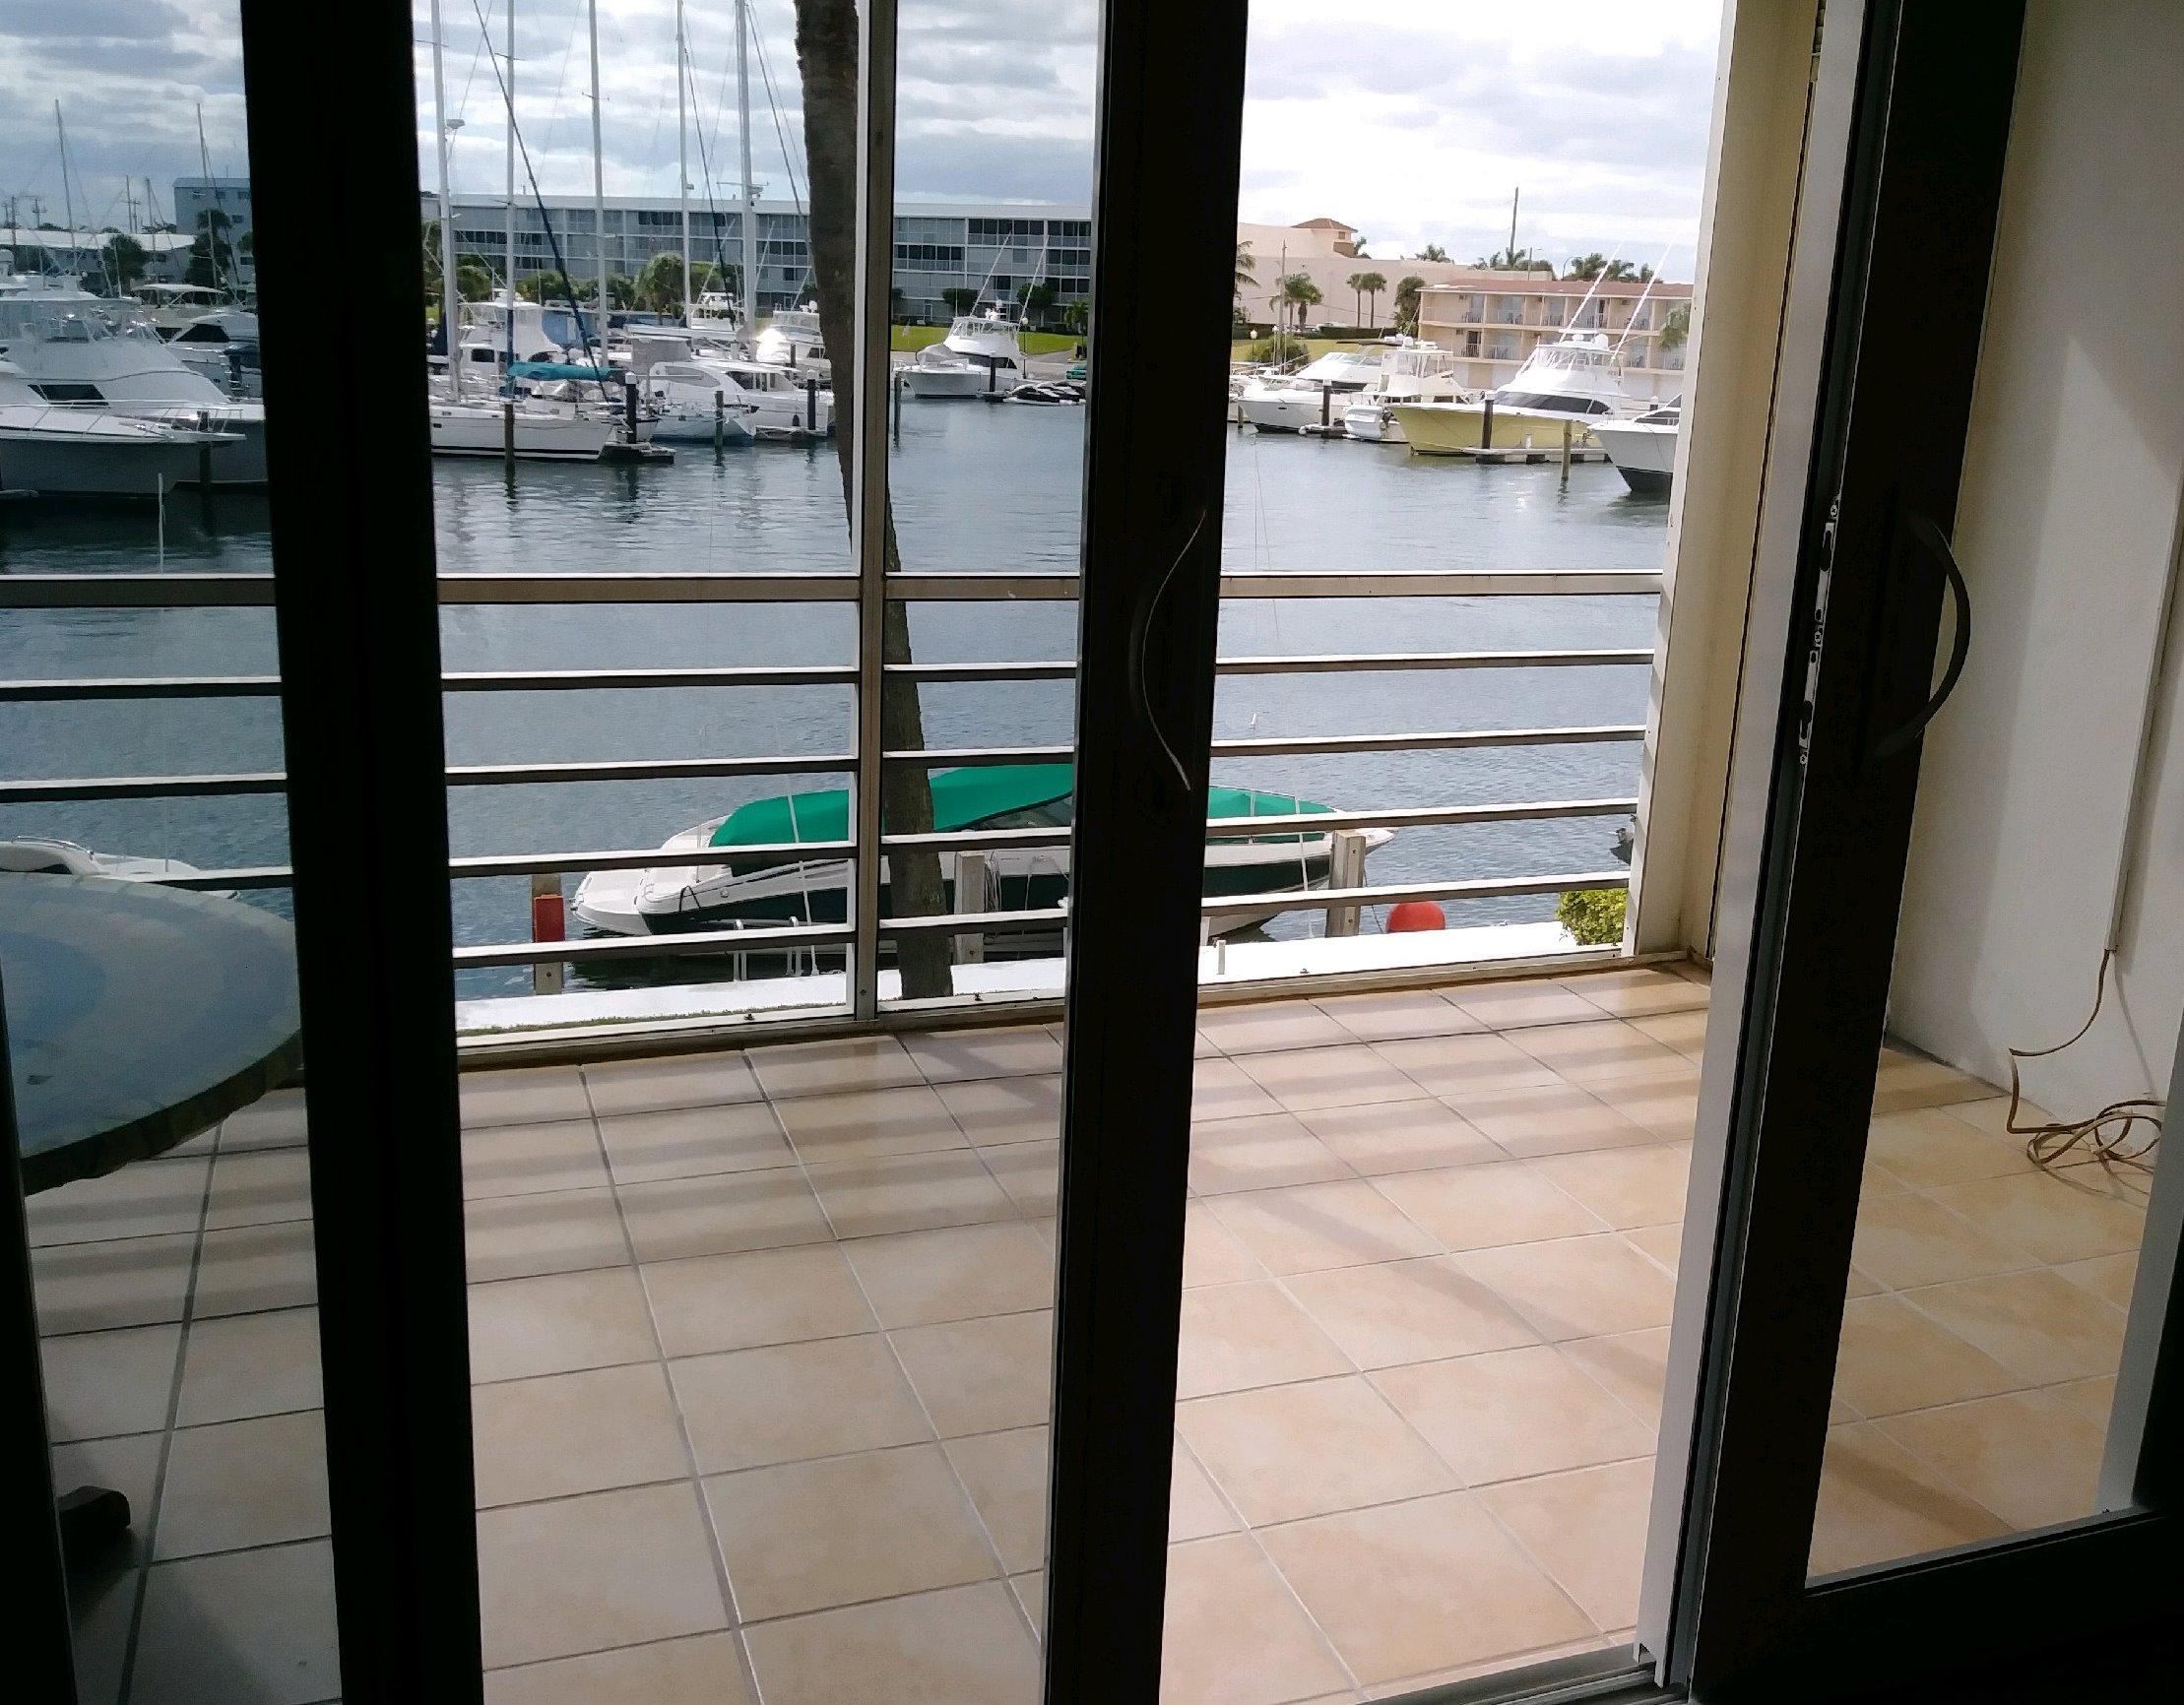 Hmt Windows Amp Doors In West Palm Beach Fl 4188 Westroads